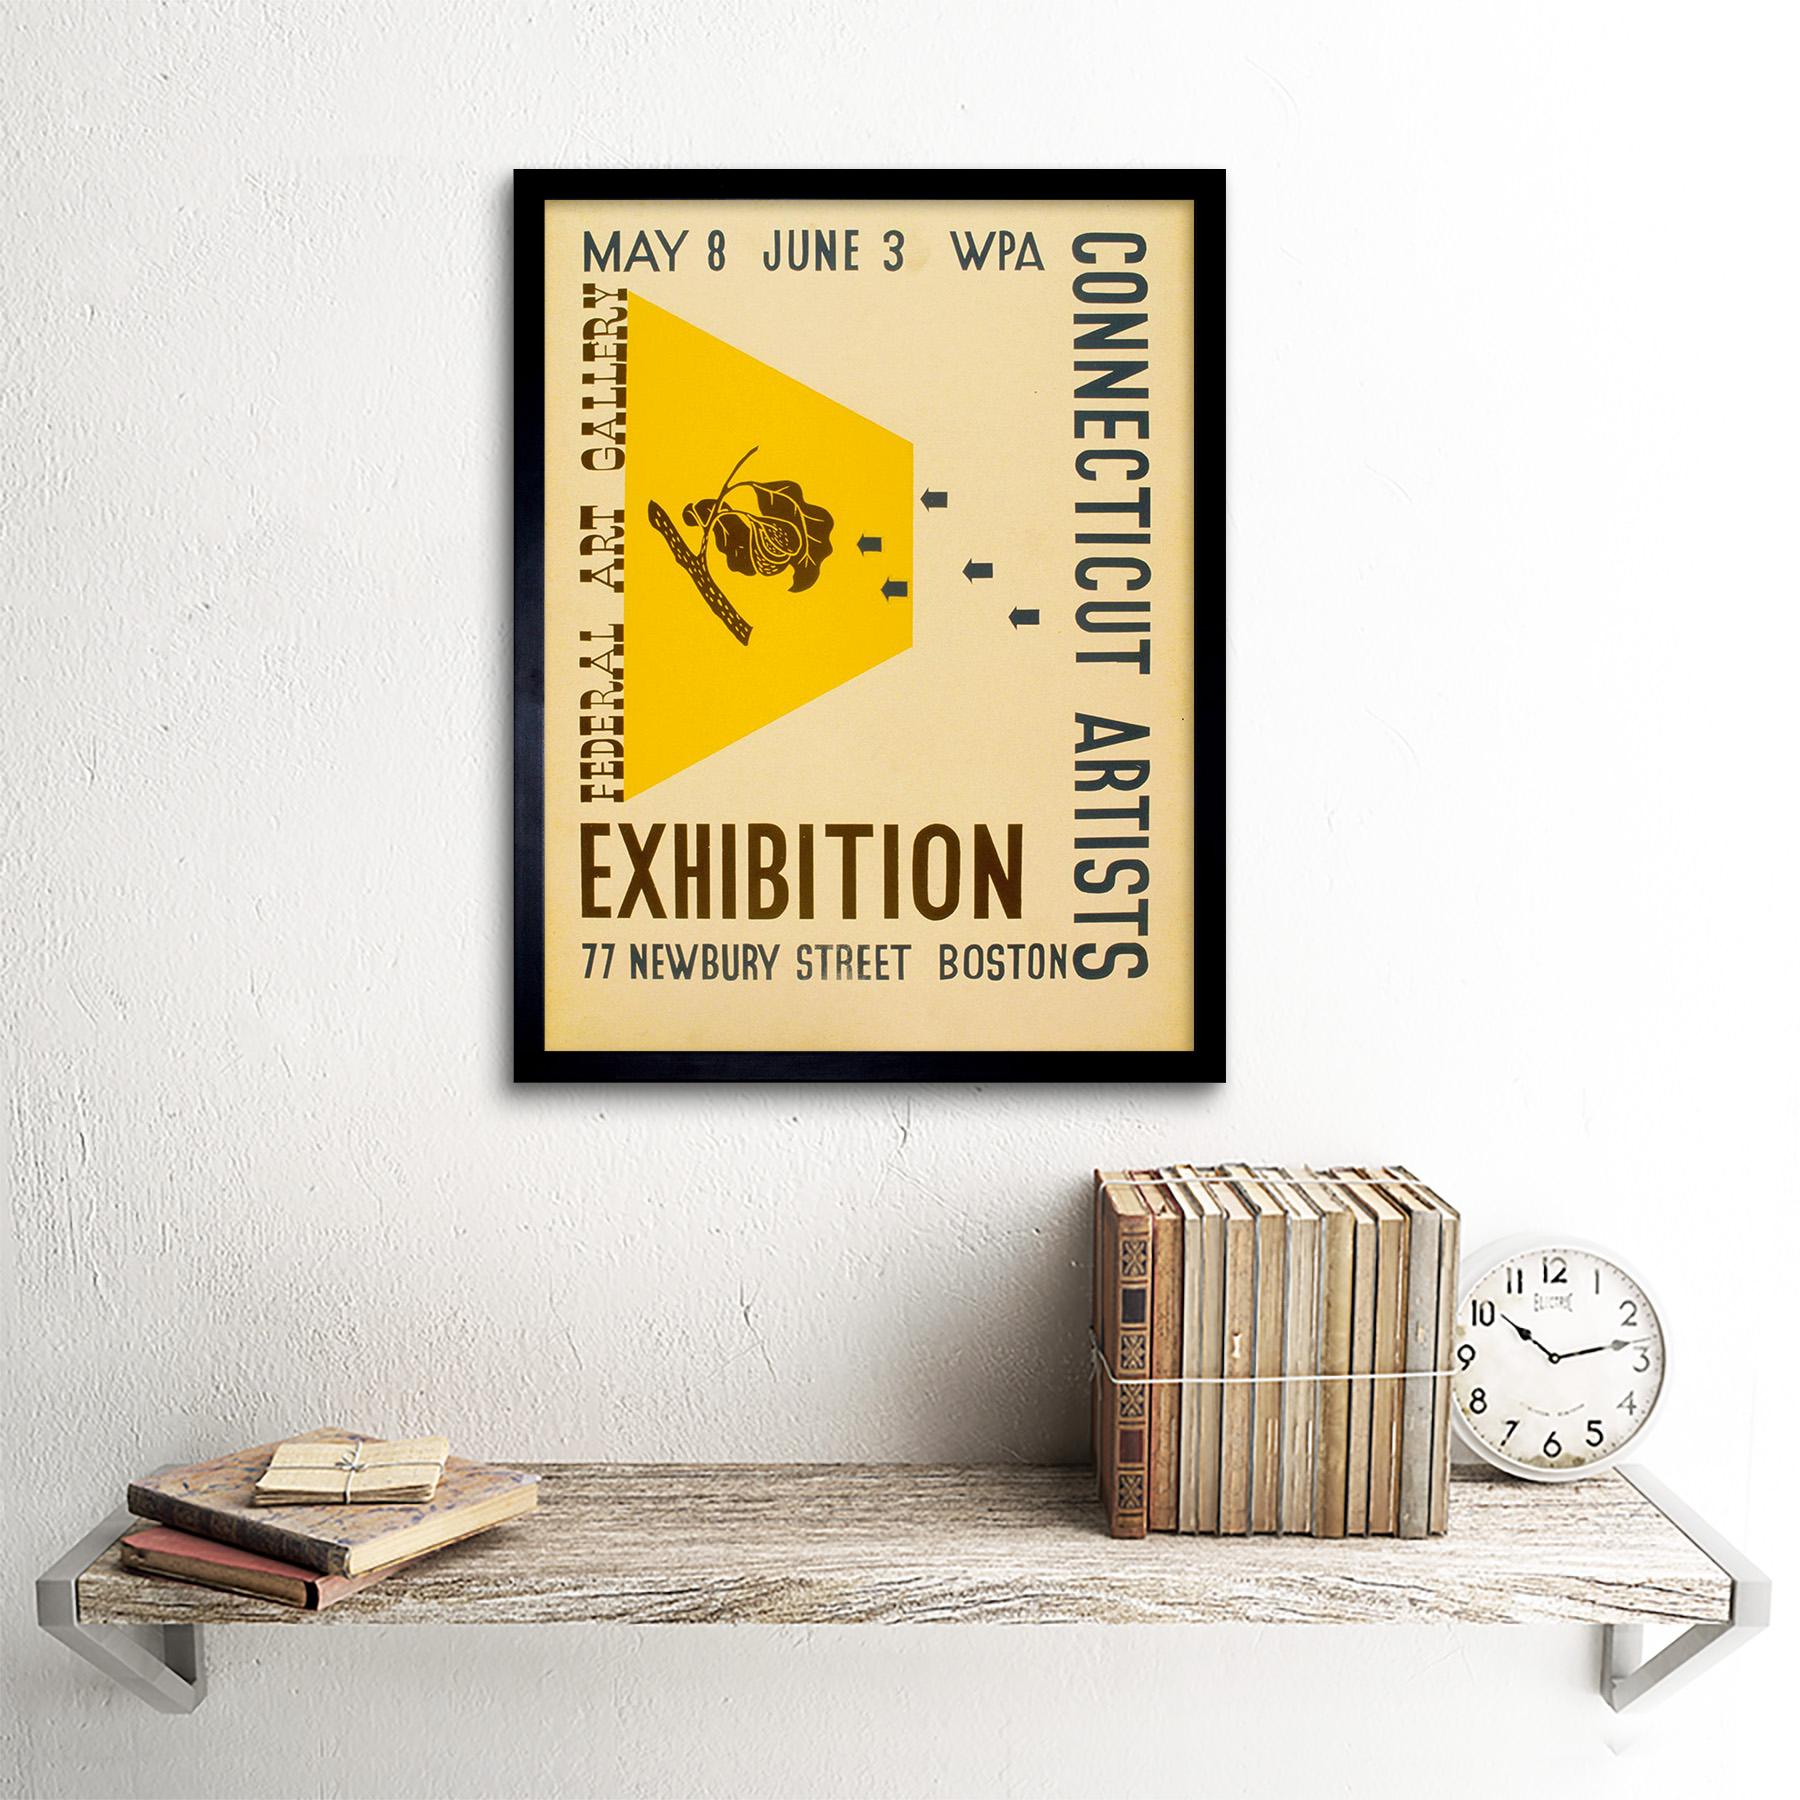 Vintage Advert Gallery Exhibition Wpa Connecticut Artist 12X16 Inch Framed Print